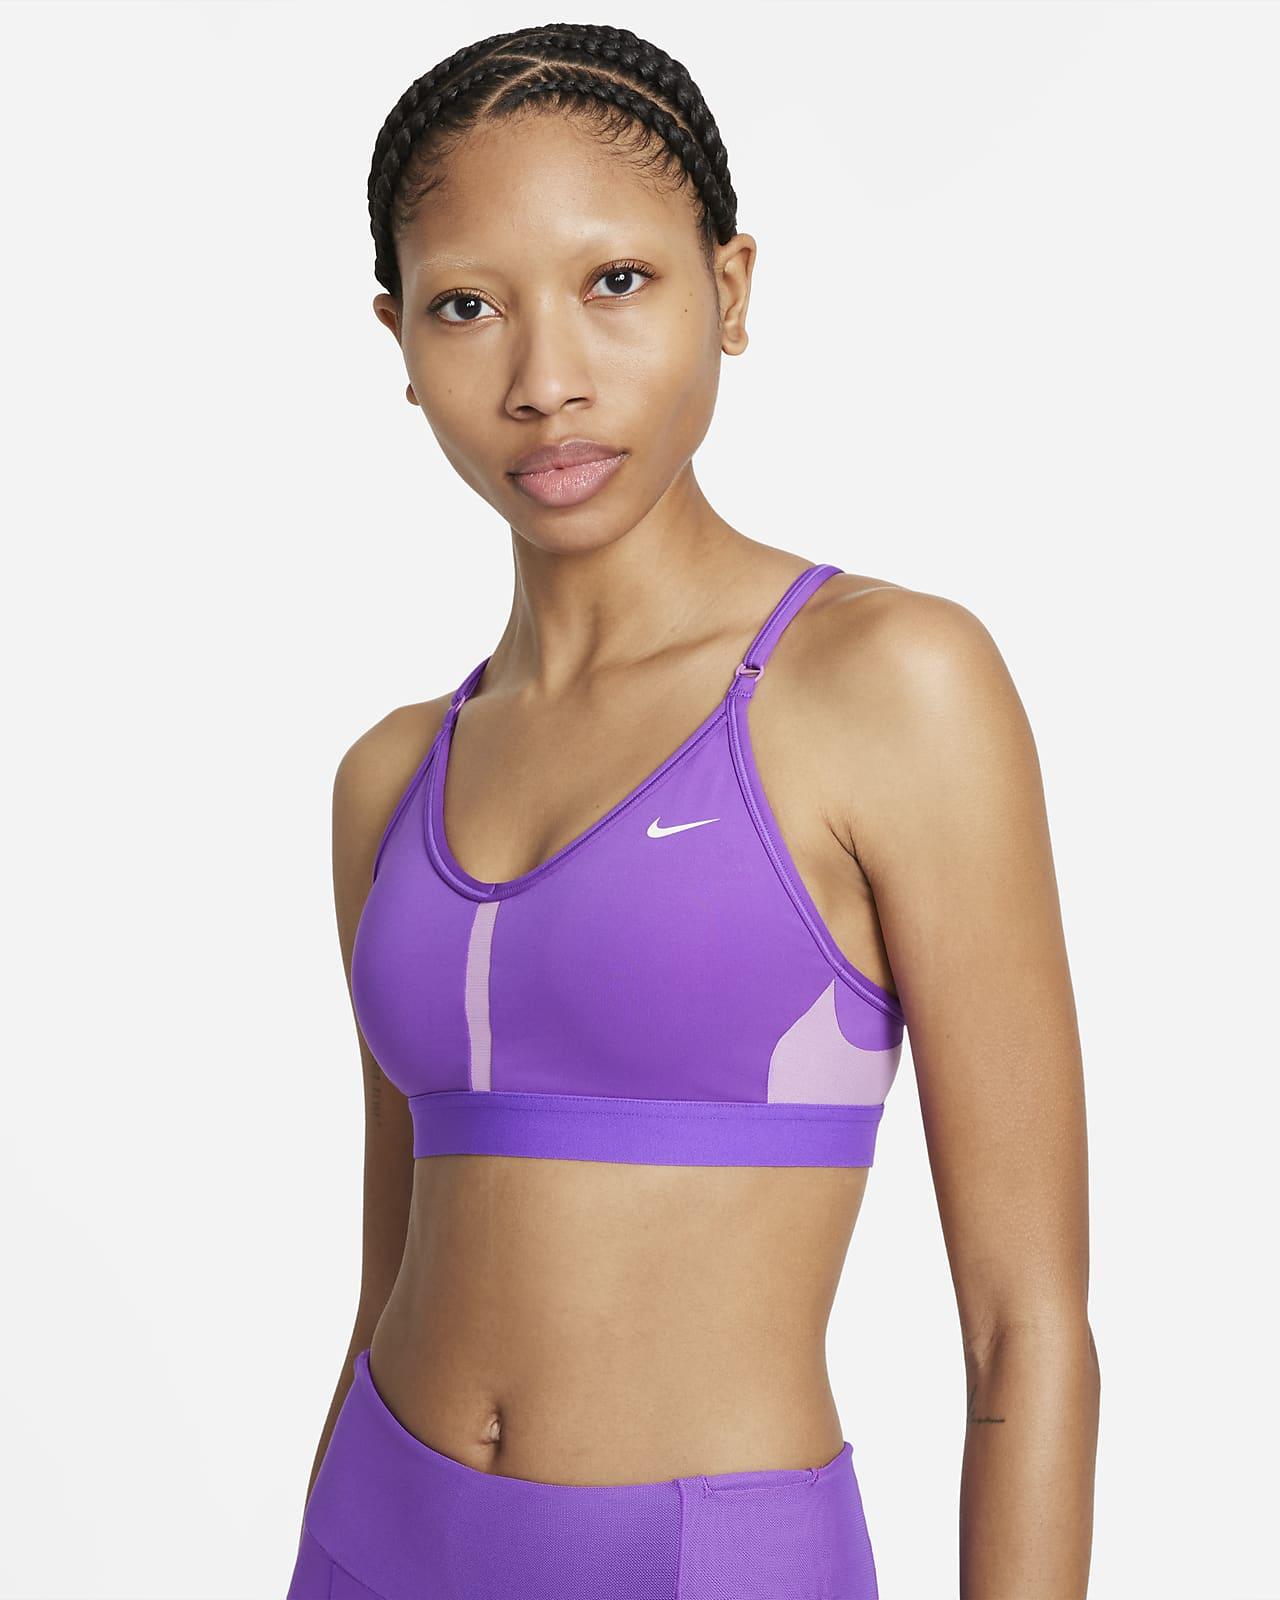 Nike Dri-FIT Indy Women's Light-Support Padded V-Neck Sports Bra